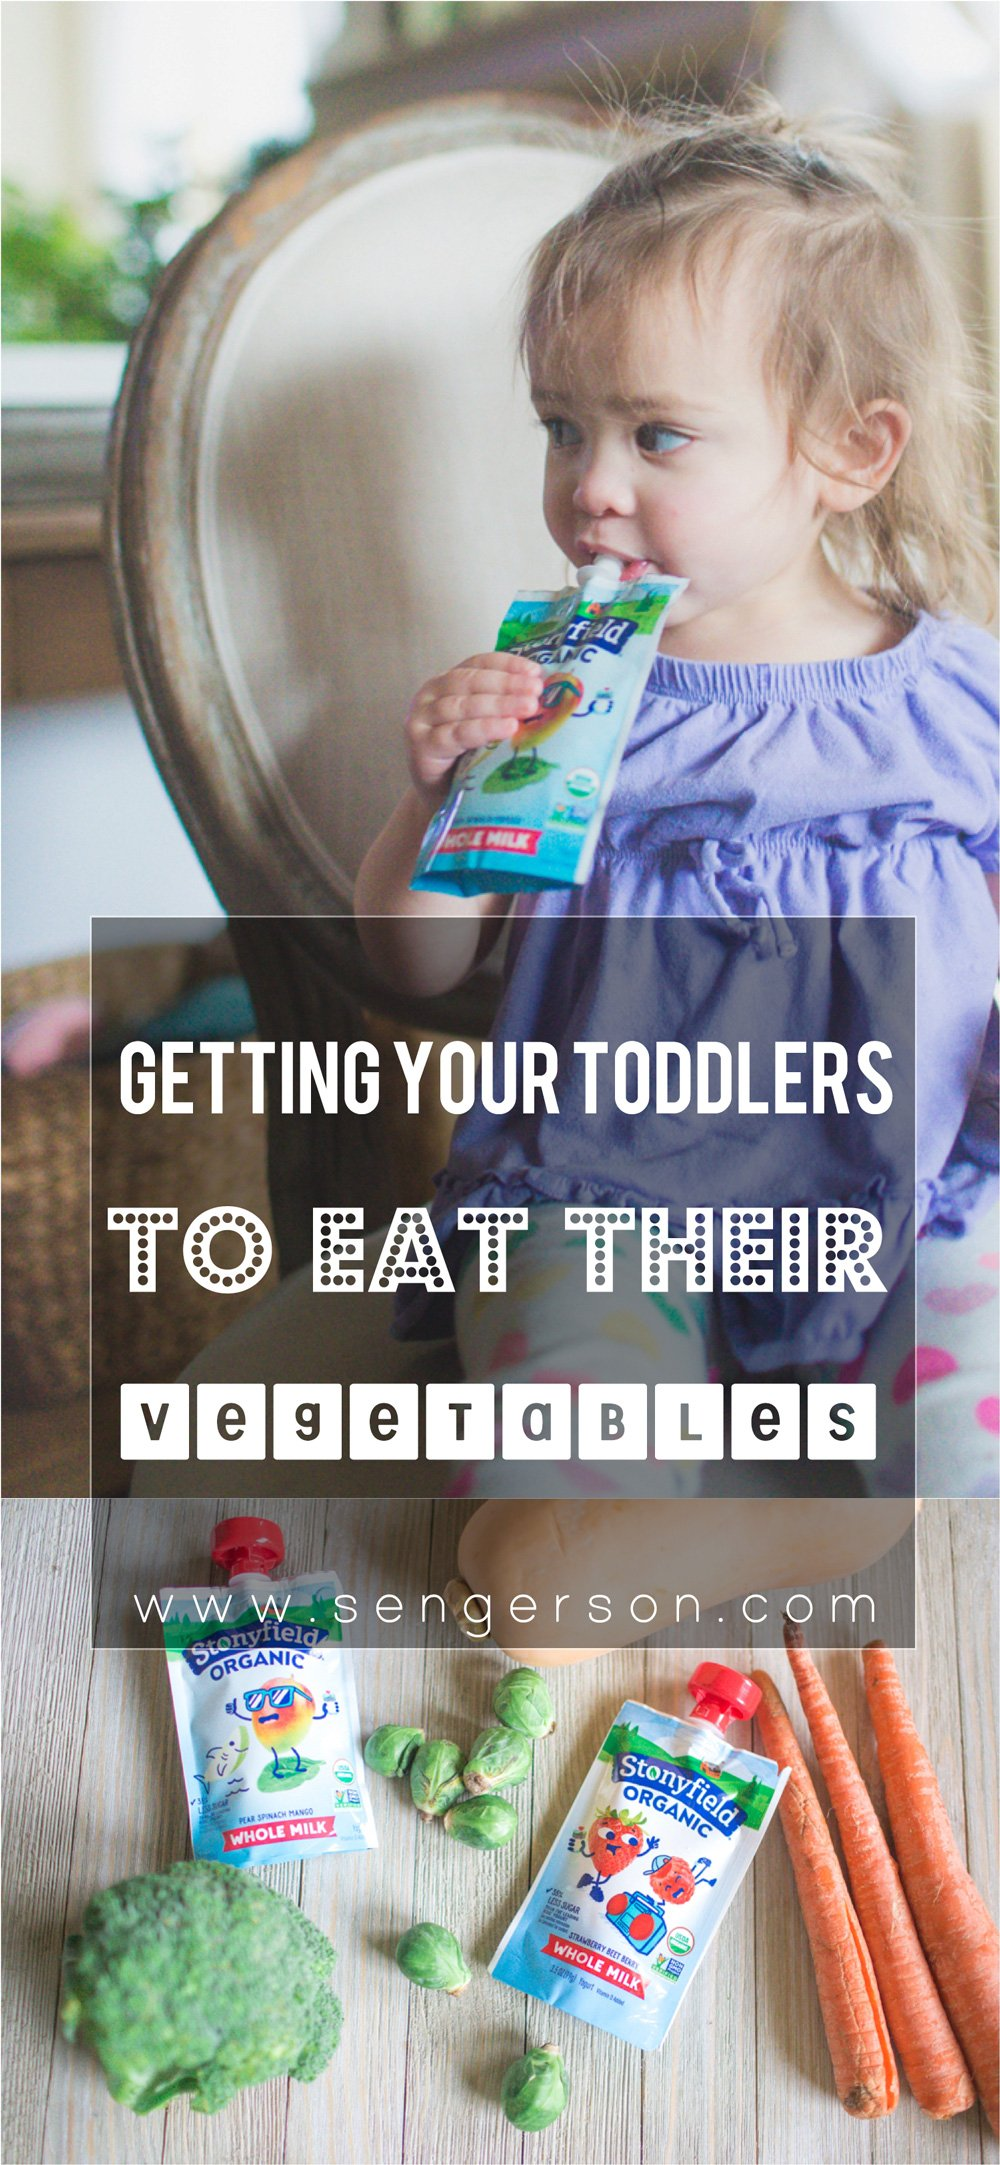 encouraging-toddlers-healthy-eating-meals-vegetables